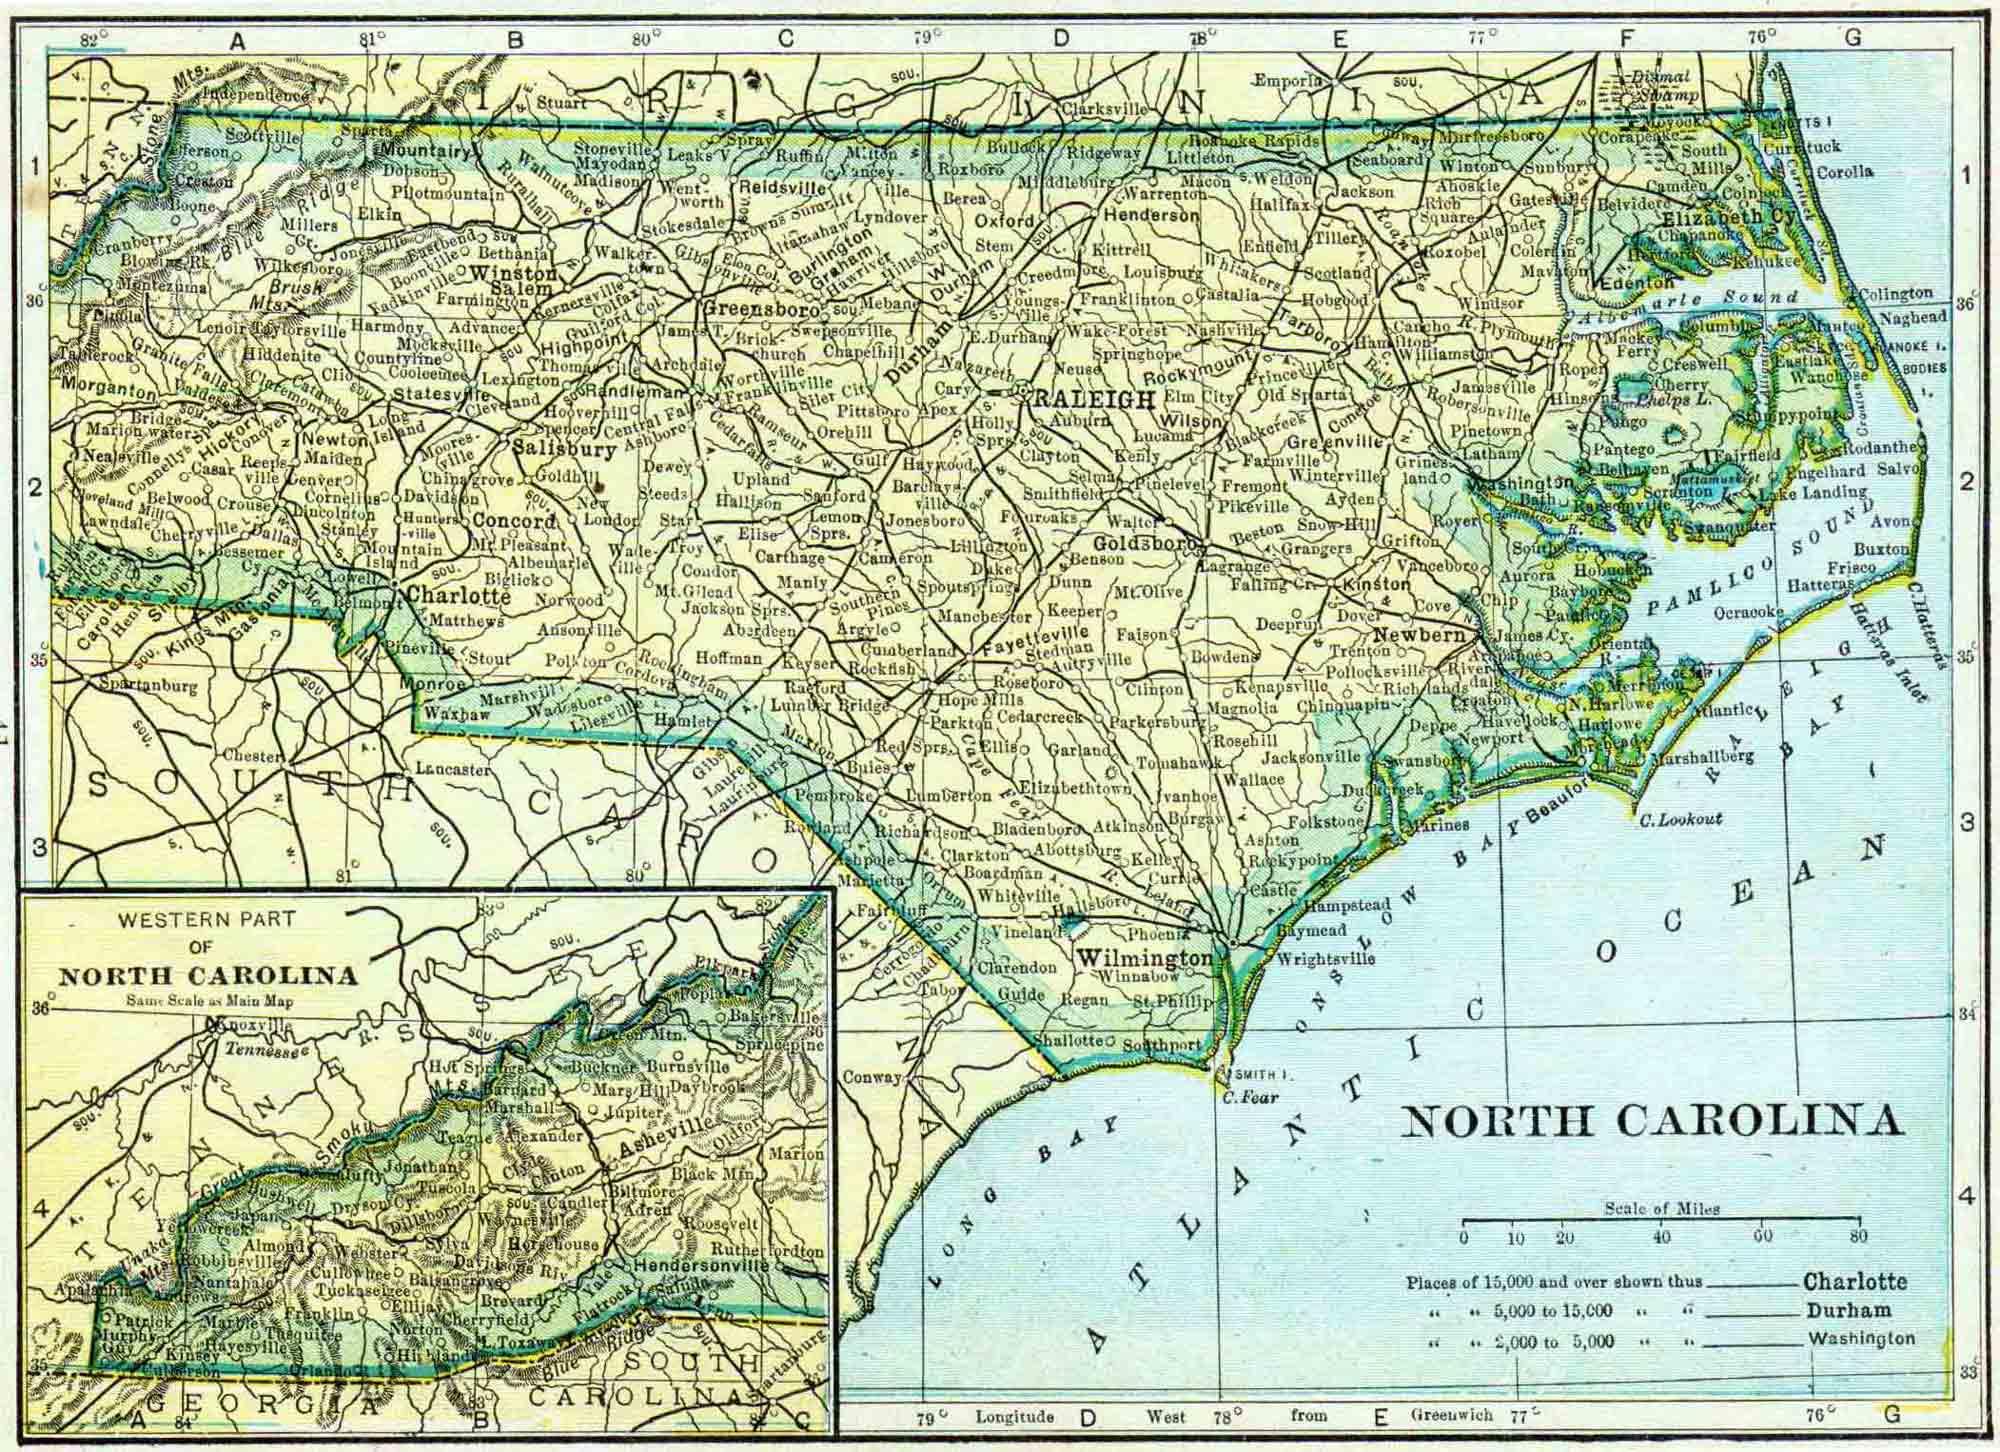 1910 North Carolina Census Map | Access Genealogy